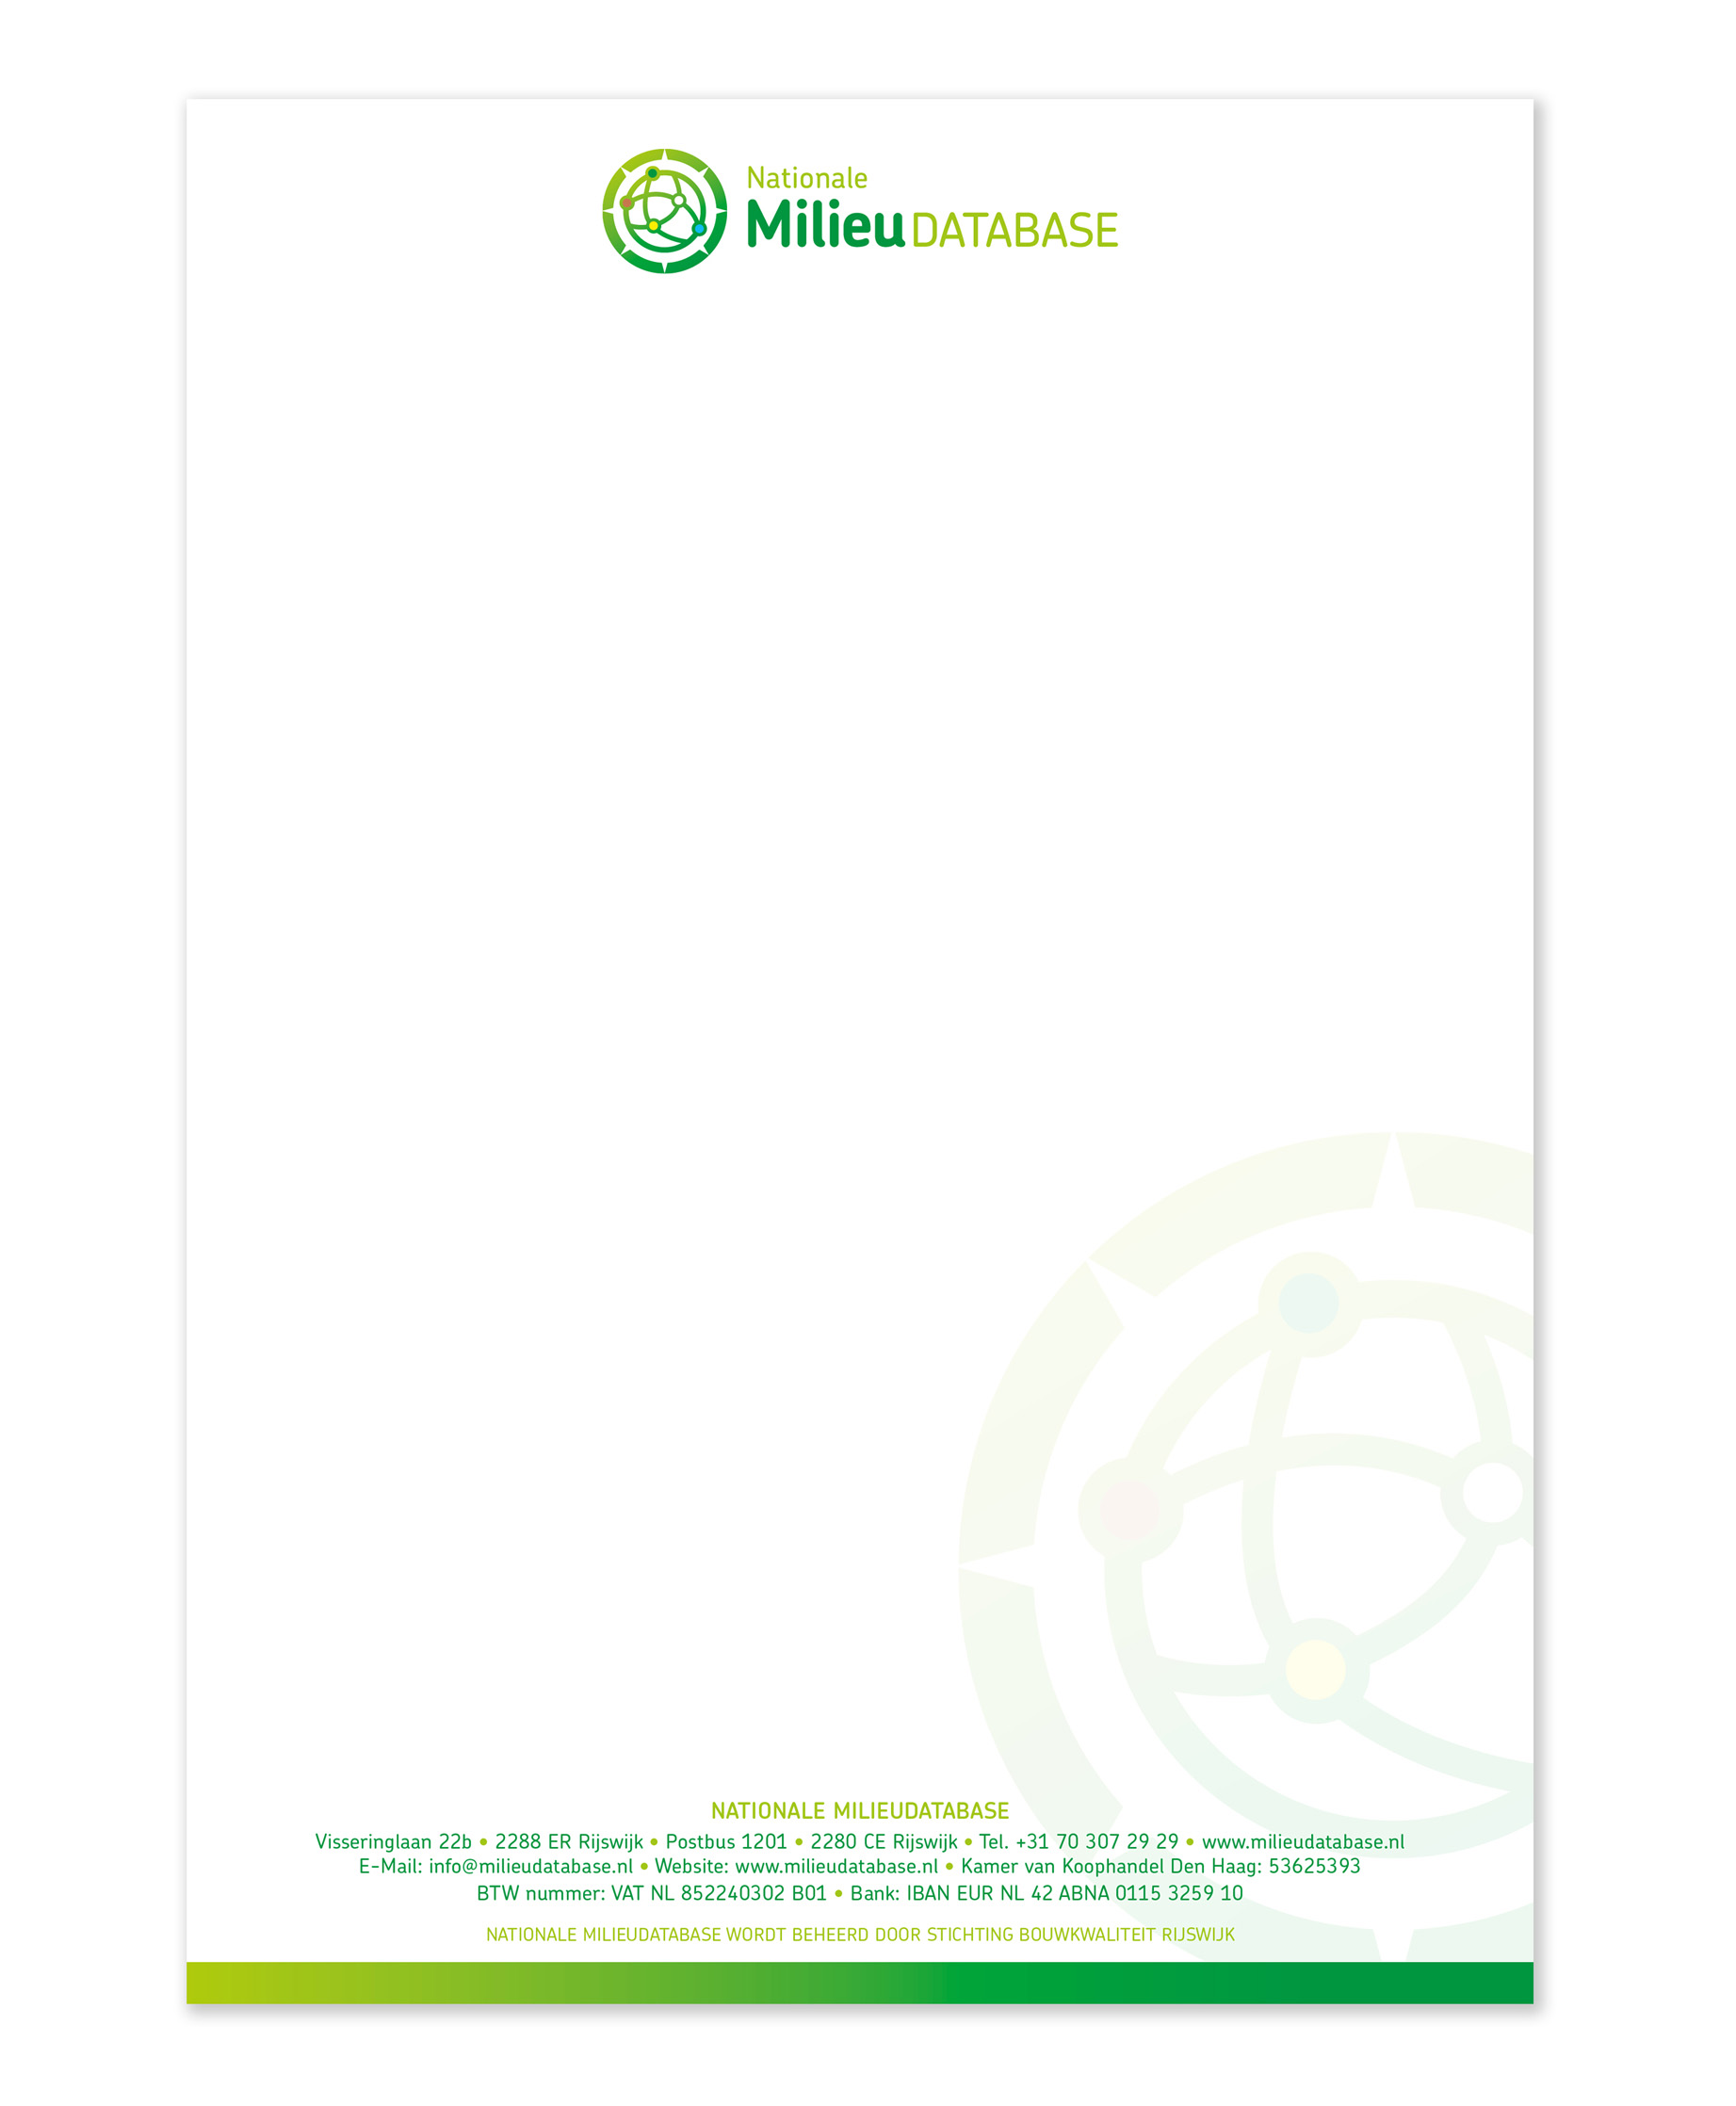 Milieudatabase_Briefpapier